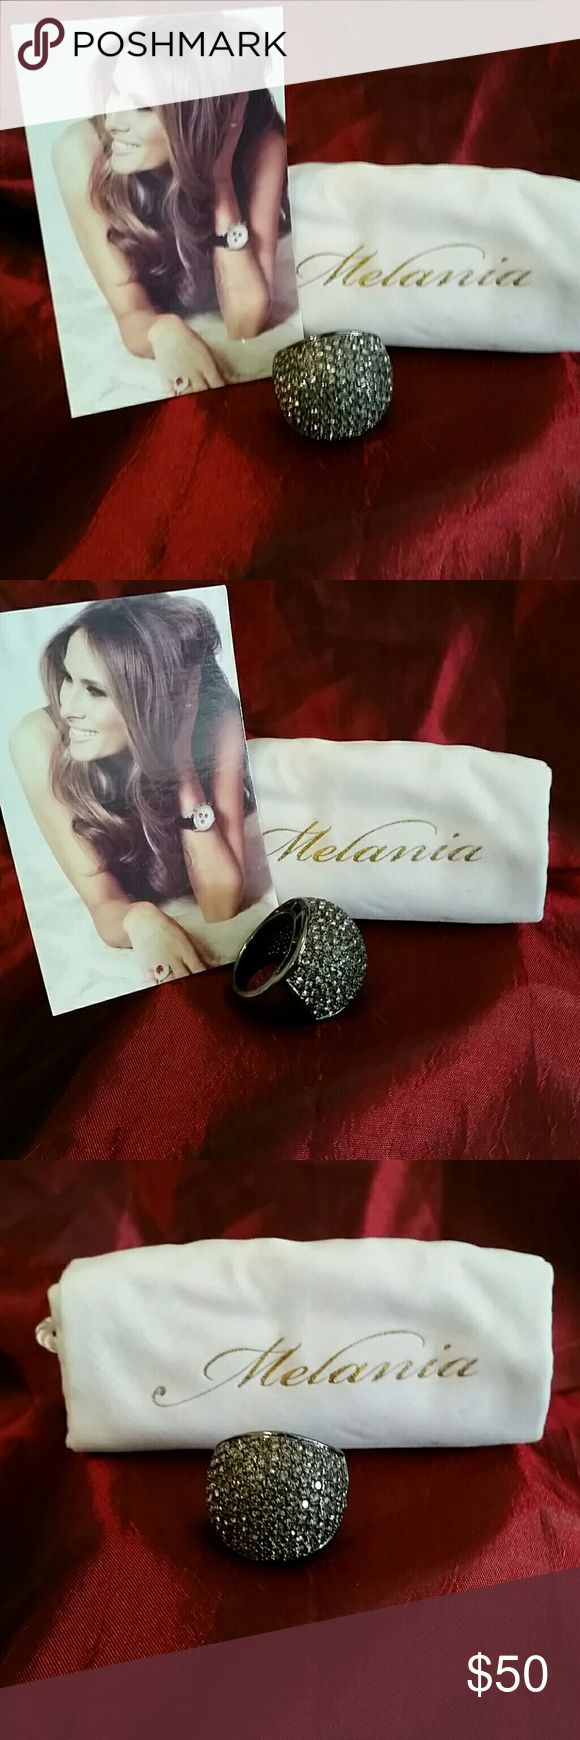 Selling this Melania Trump Black Dome Ring on Poshmark! My username is: fashionamazon. #shopmycloset #poshmark #fashion #shopping #style #forsale #Melania Trump  #Jewelry